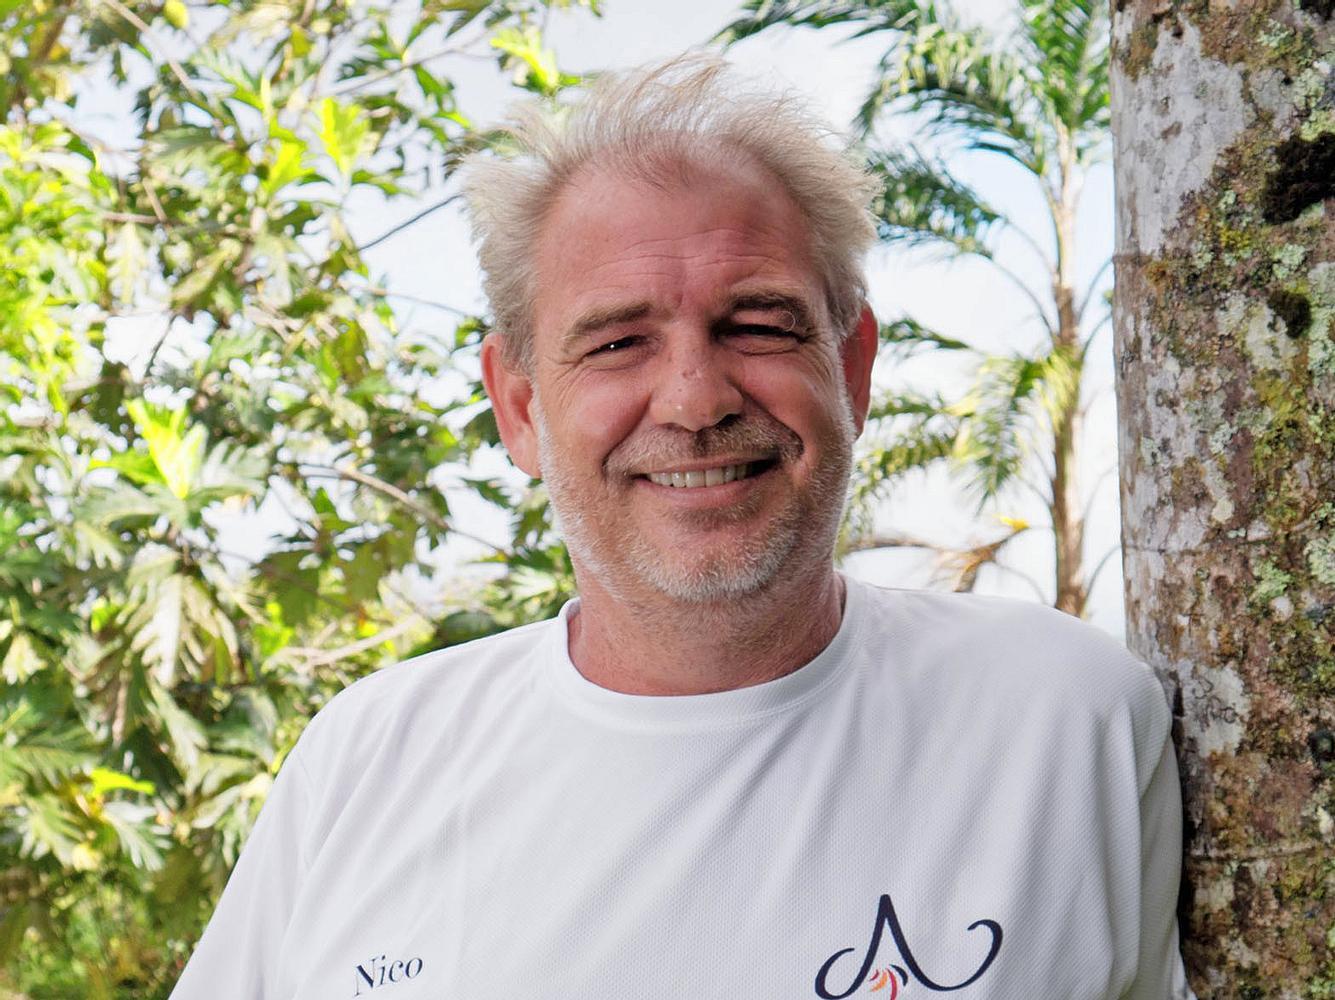 'Bauer sucht Frau International'-Teilnehmer Nico aus Costa Rica.